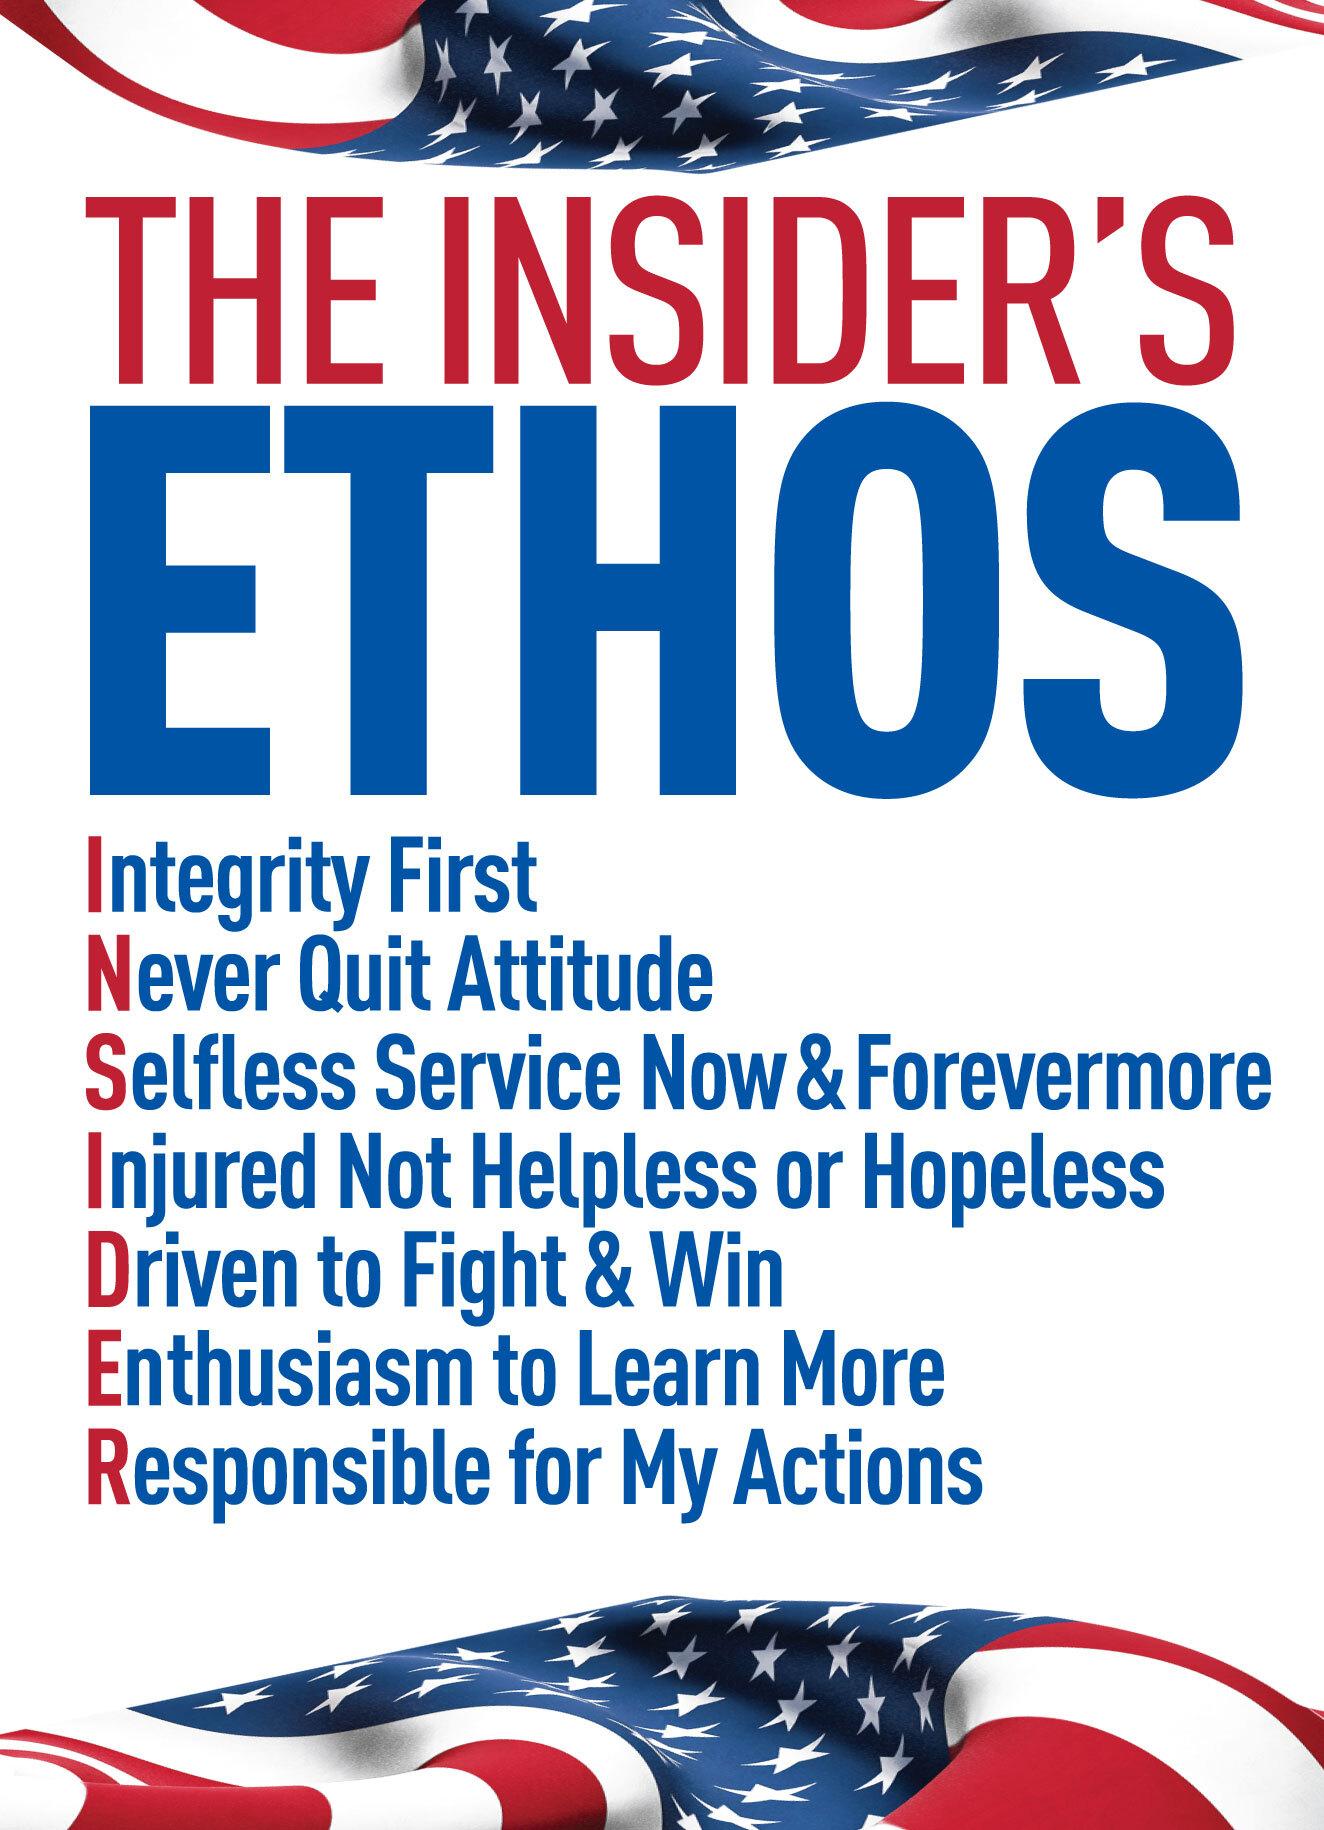 VA Claims Insider Ethos